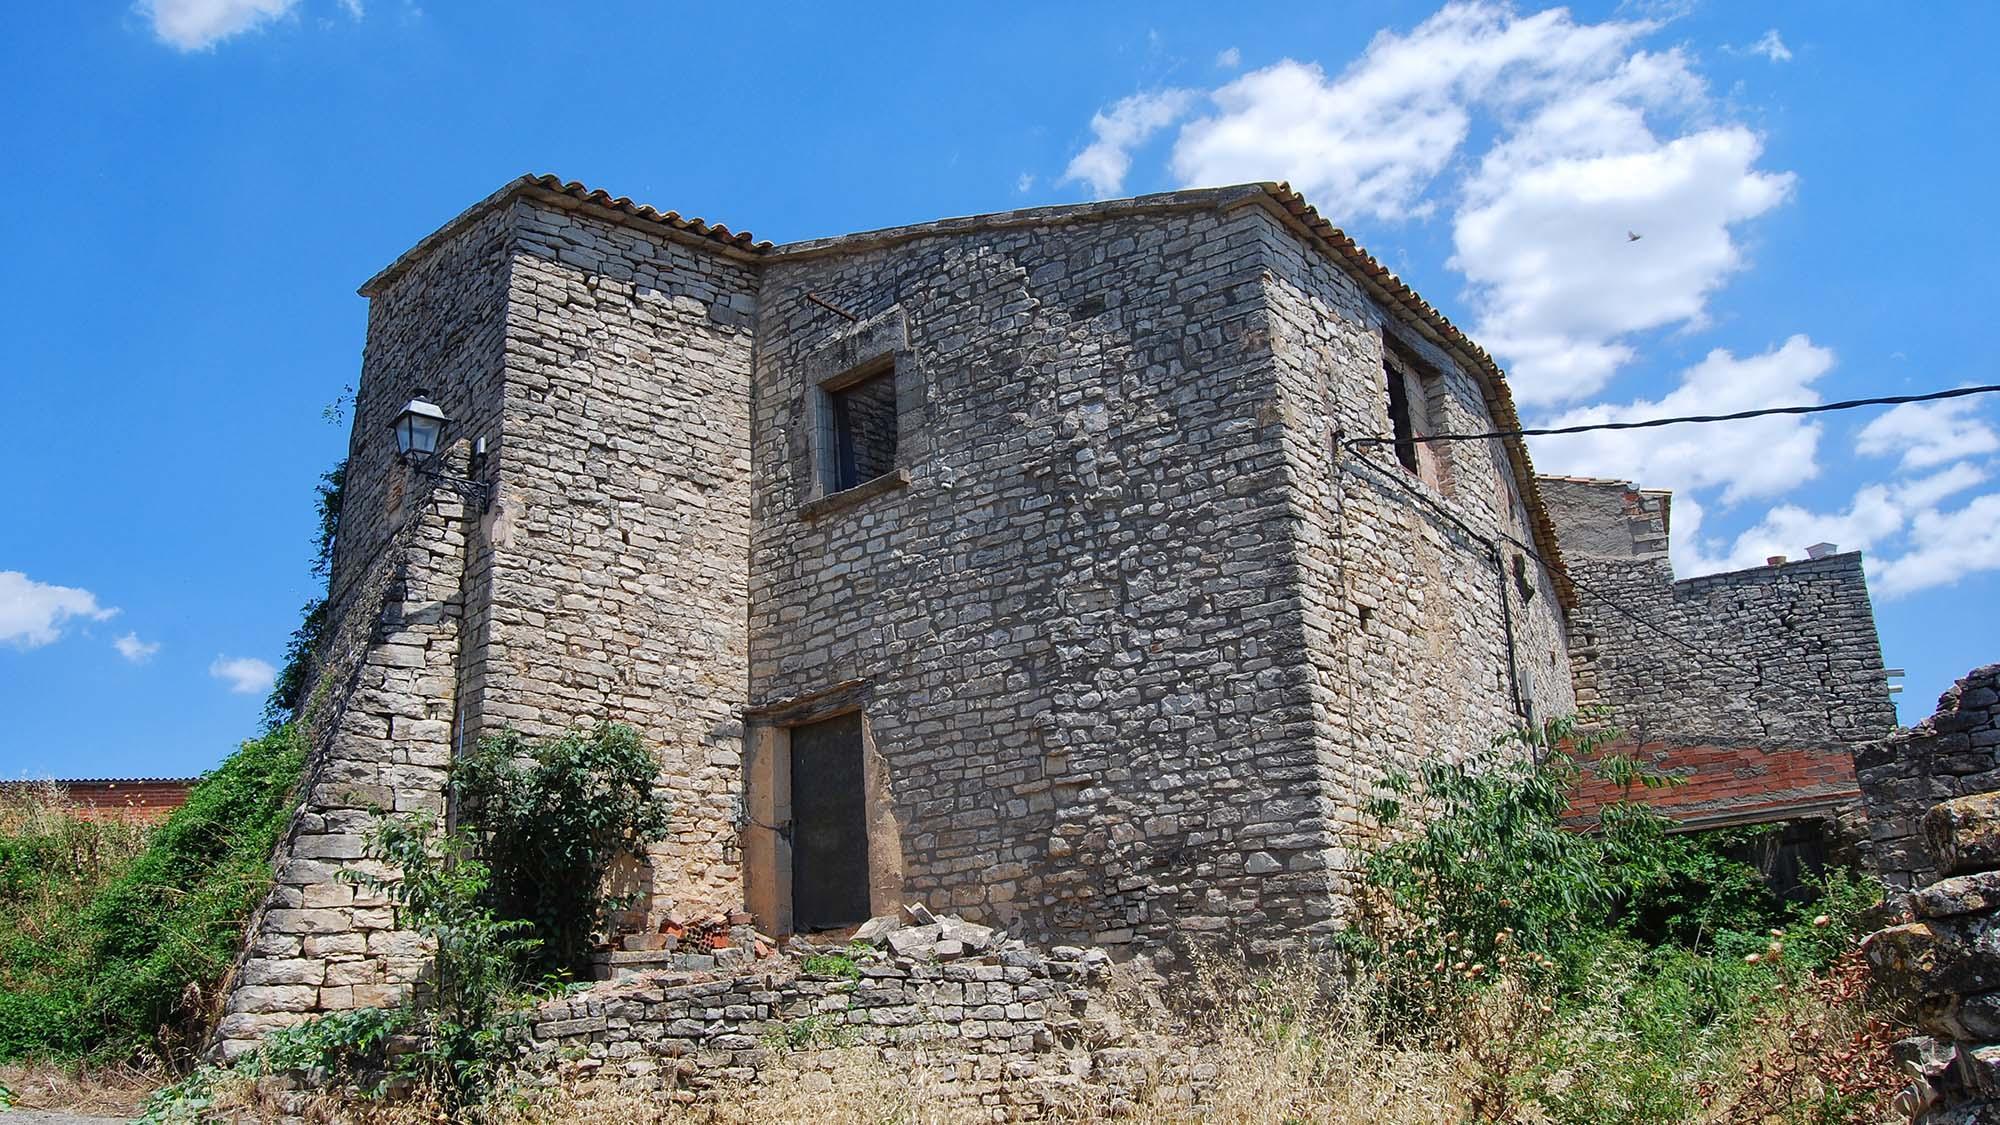 Castillo de Santa Maria